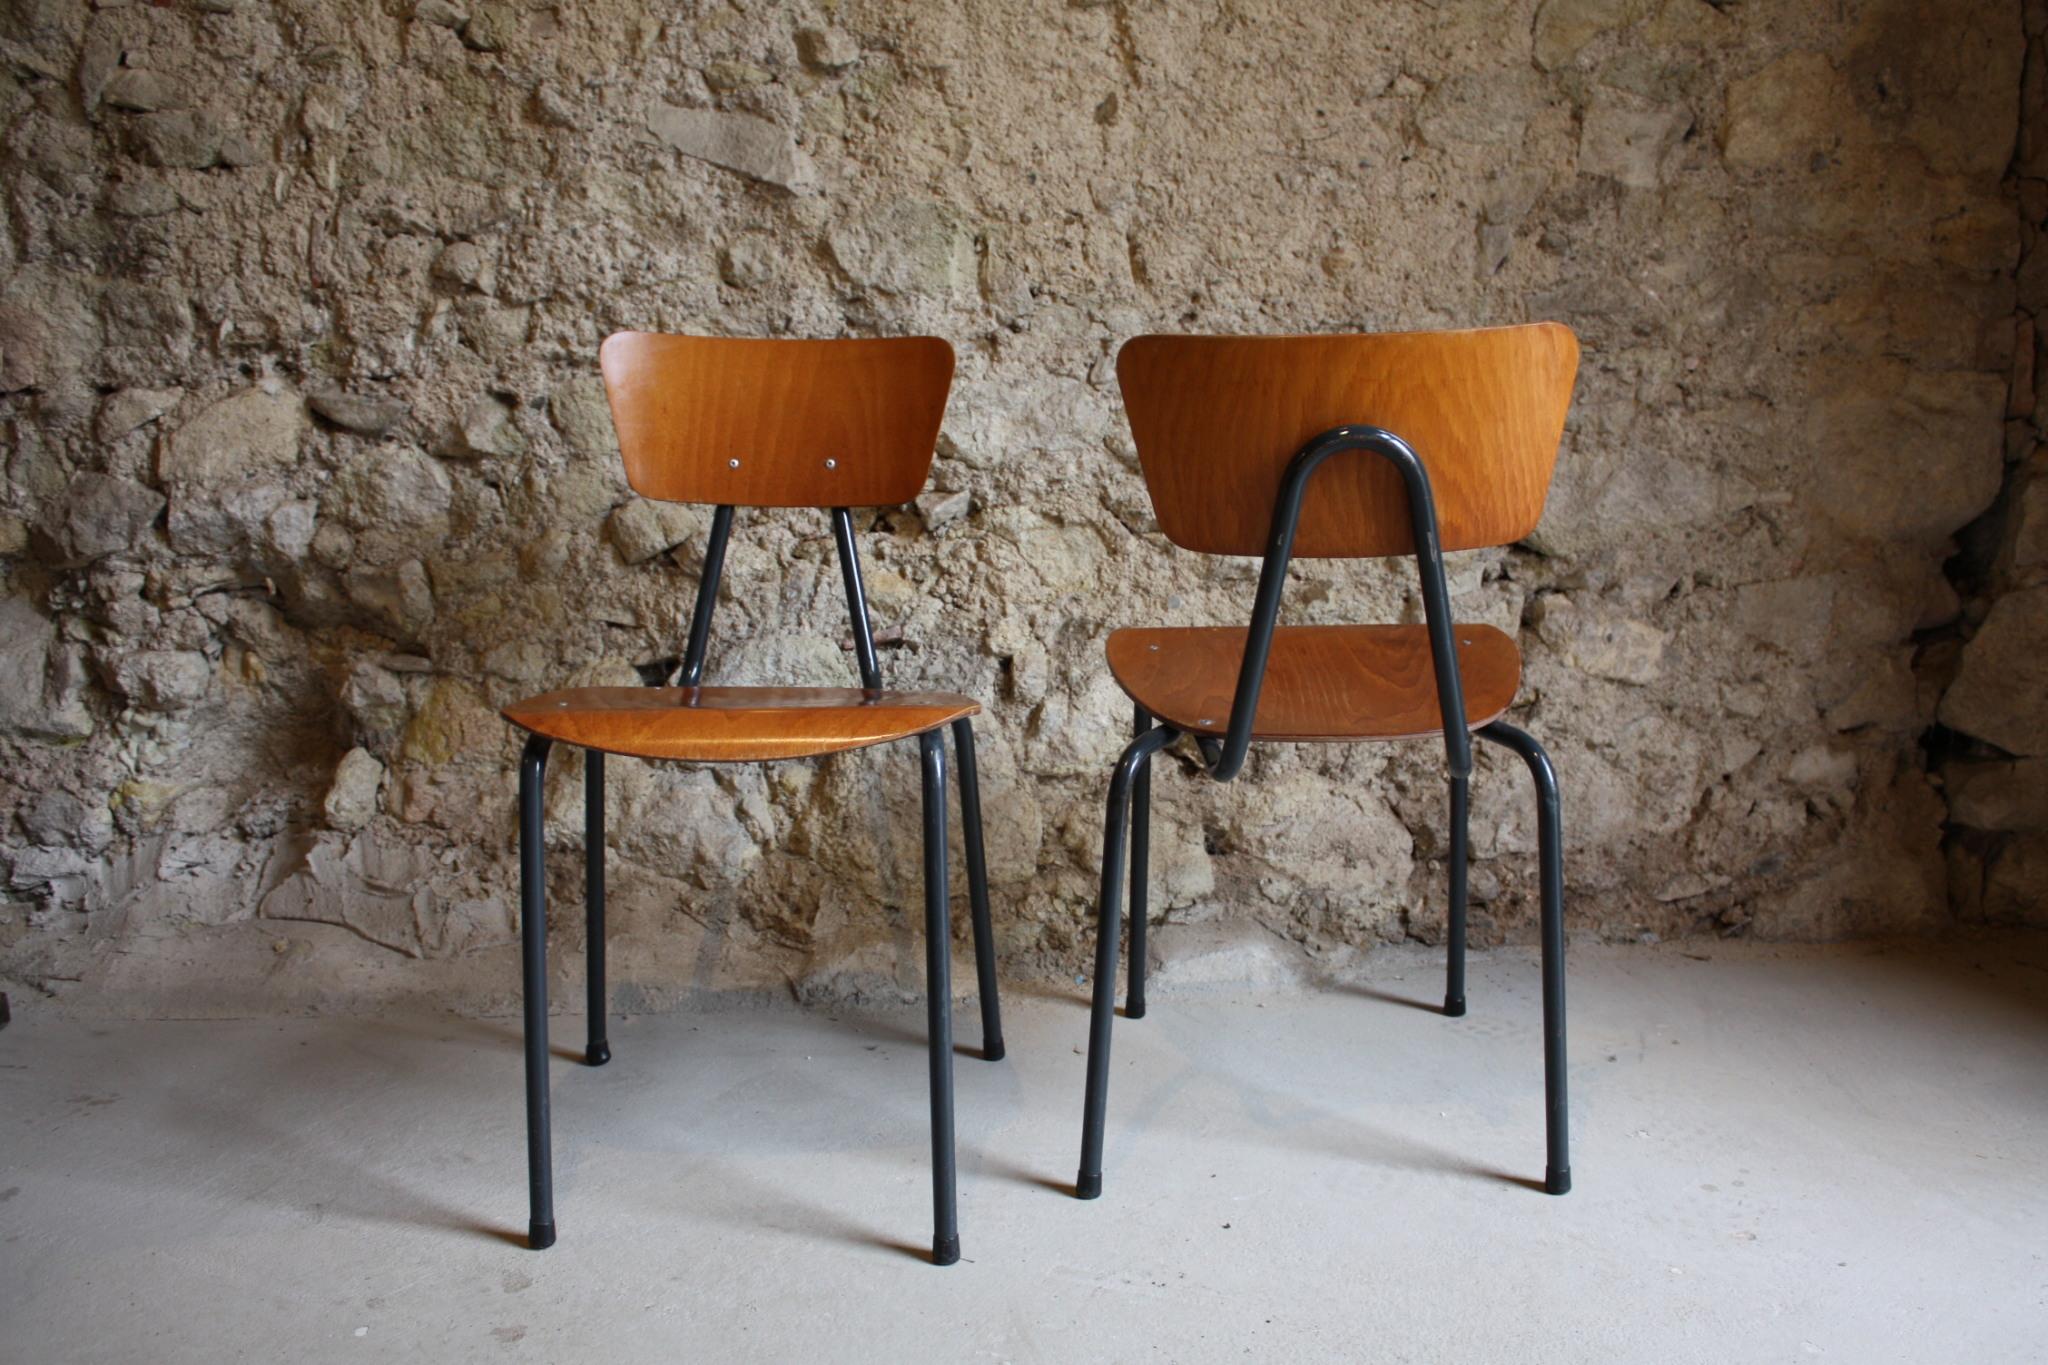 alte-gebrauchte-stuhle-antik-midcentury-modern-eames-ara-60er-loft-bauhaus-1